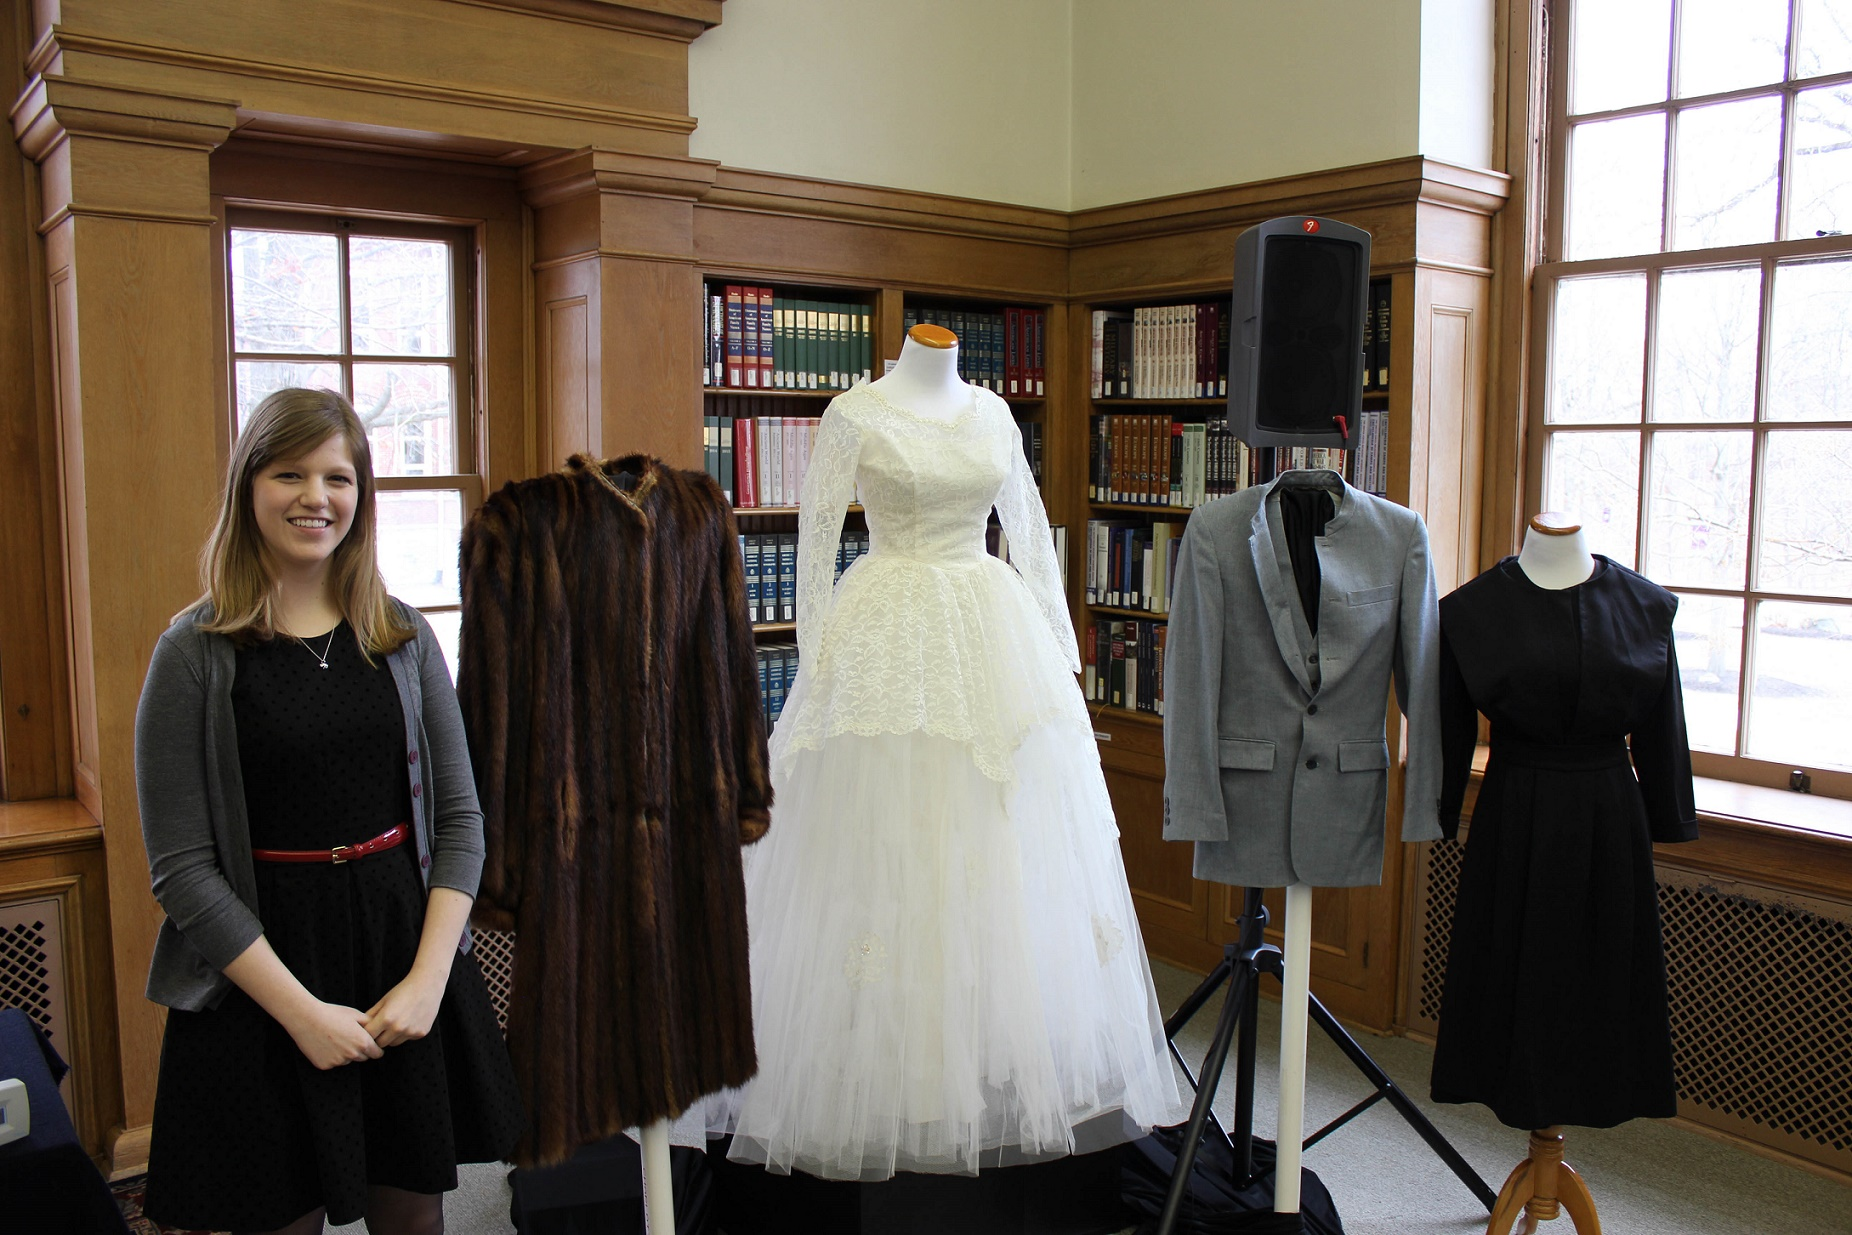 Uncovering A Historic Mennonite Costume Collection